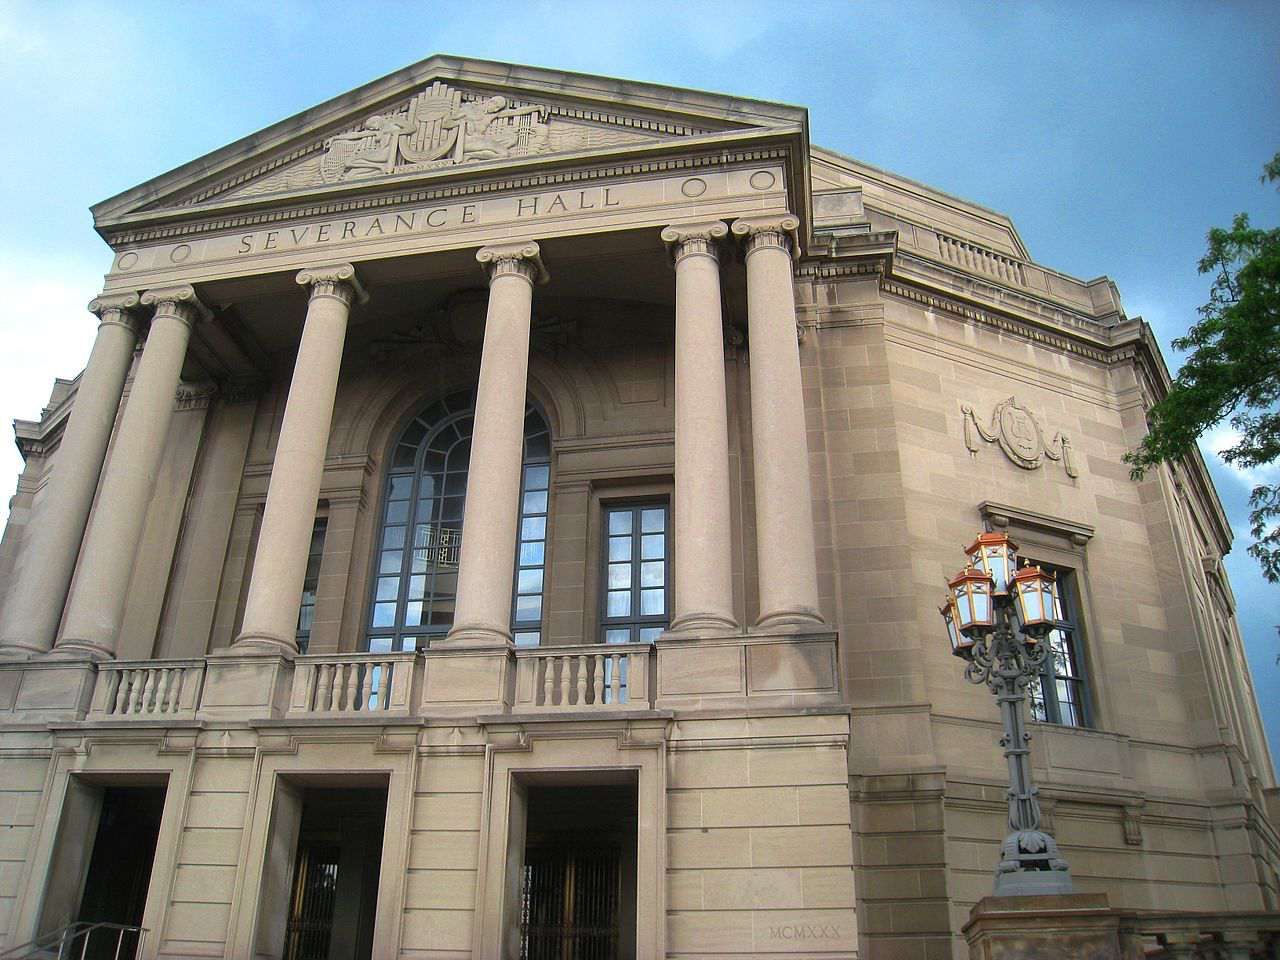 Severance Hall, Cleveland, Ohio, USA